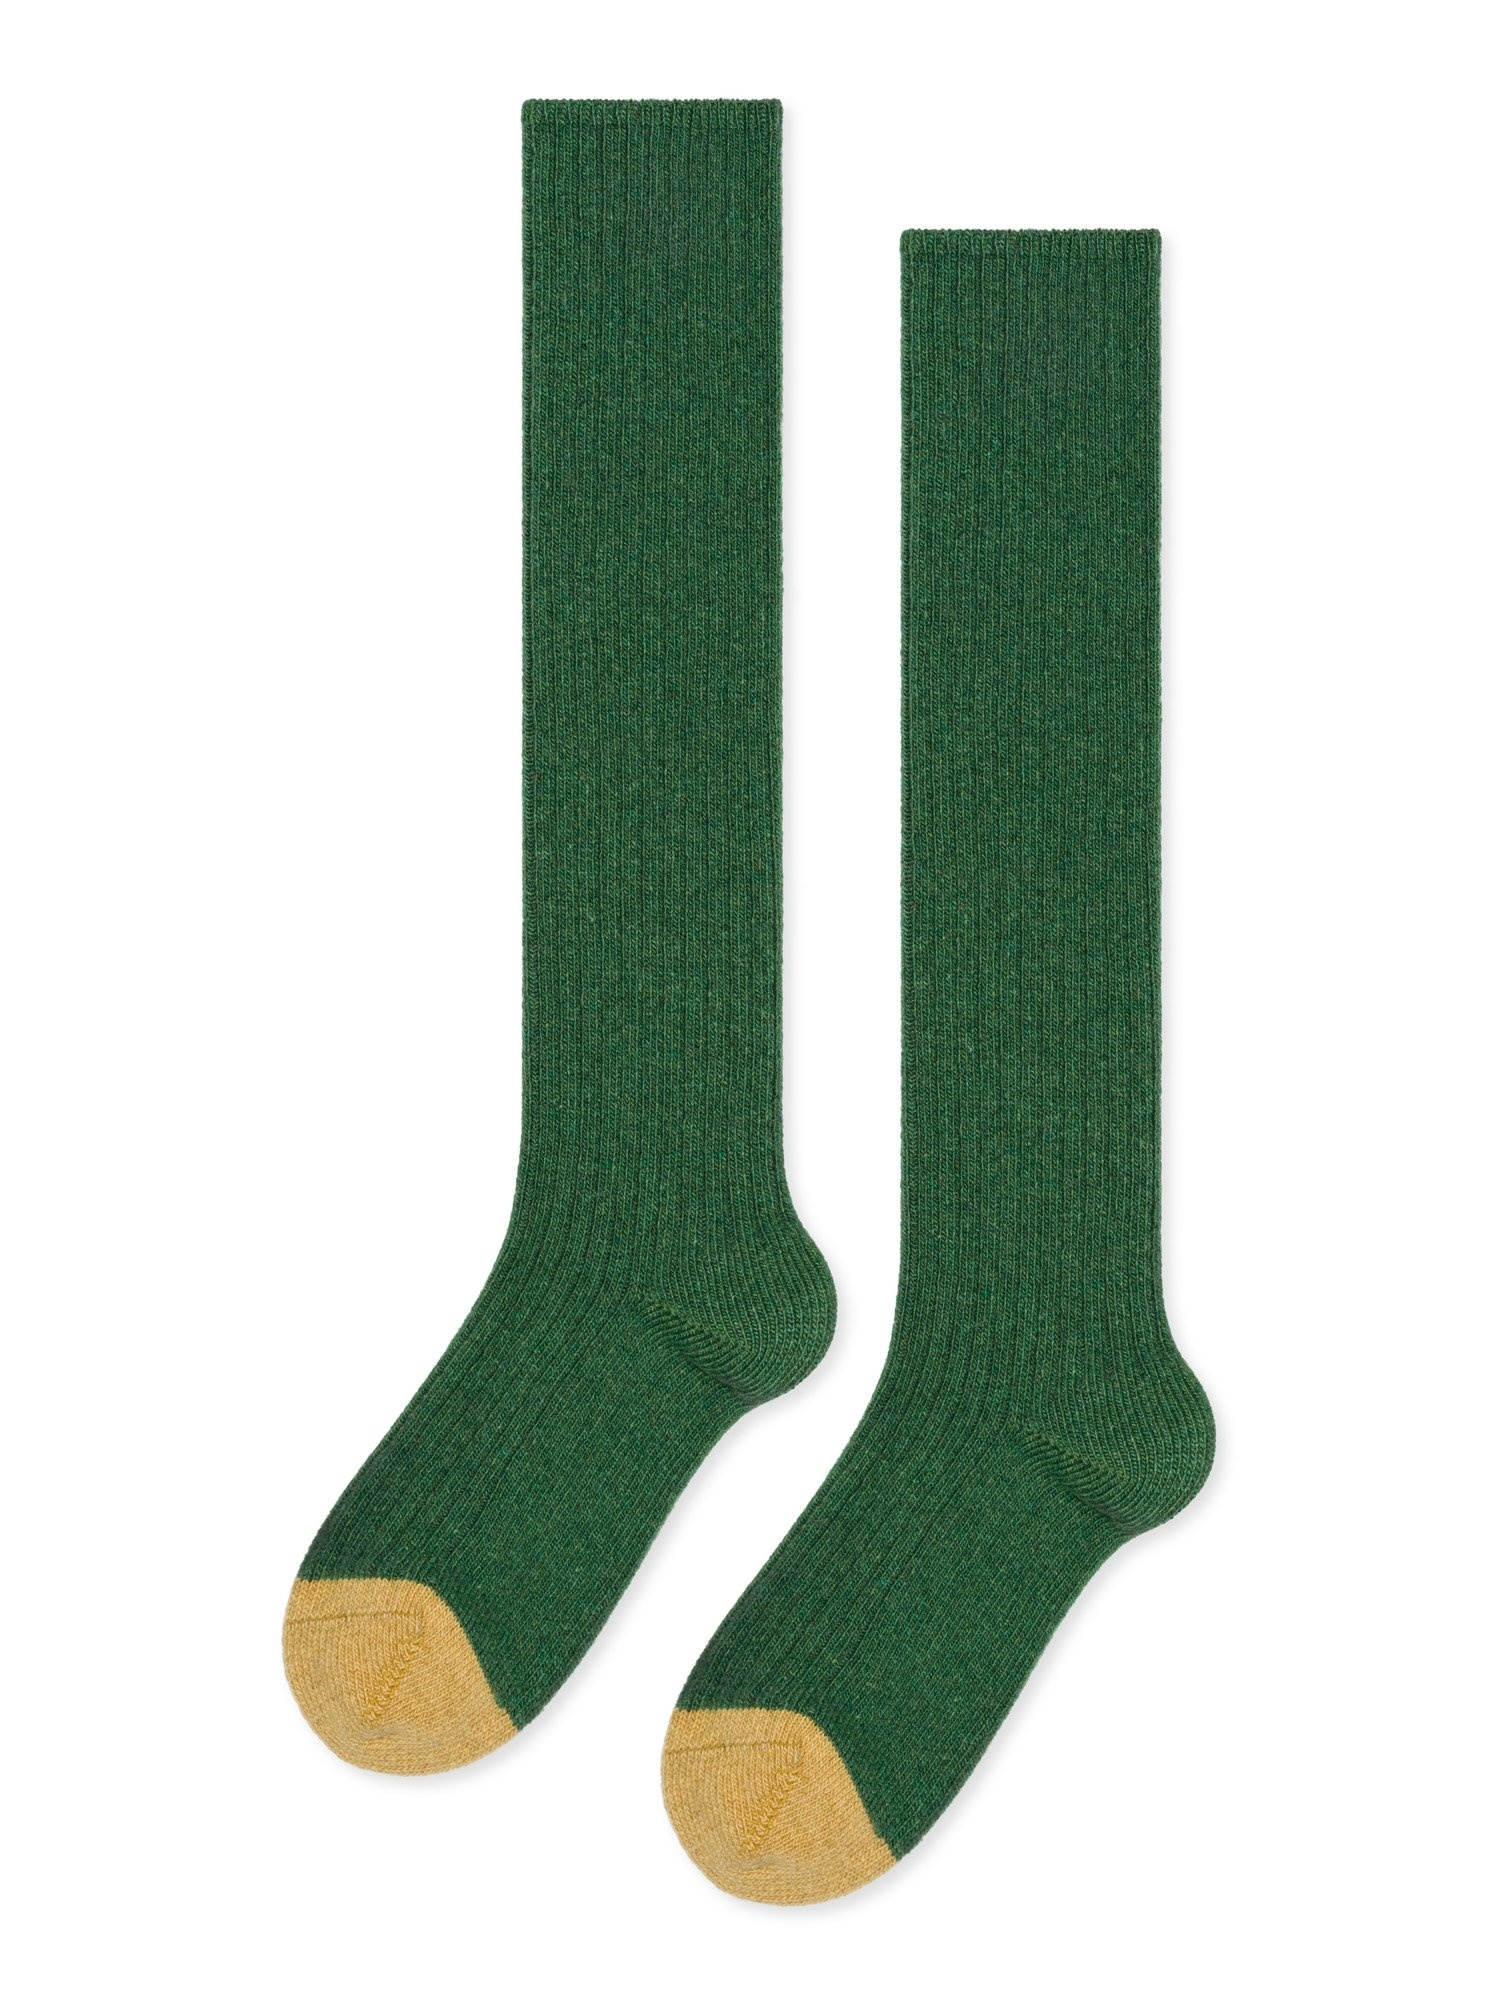 Hansel From Basel Hansel from Basel Skinny Rib Cashmere Knee Hi Sock in Kermit Green